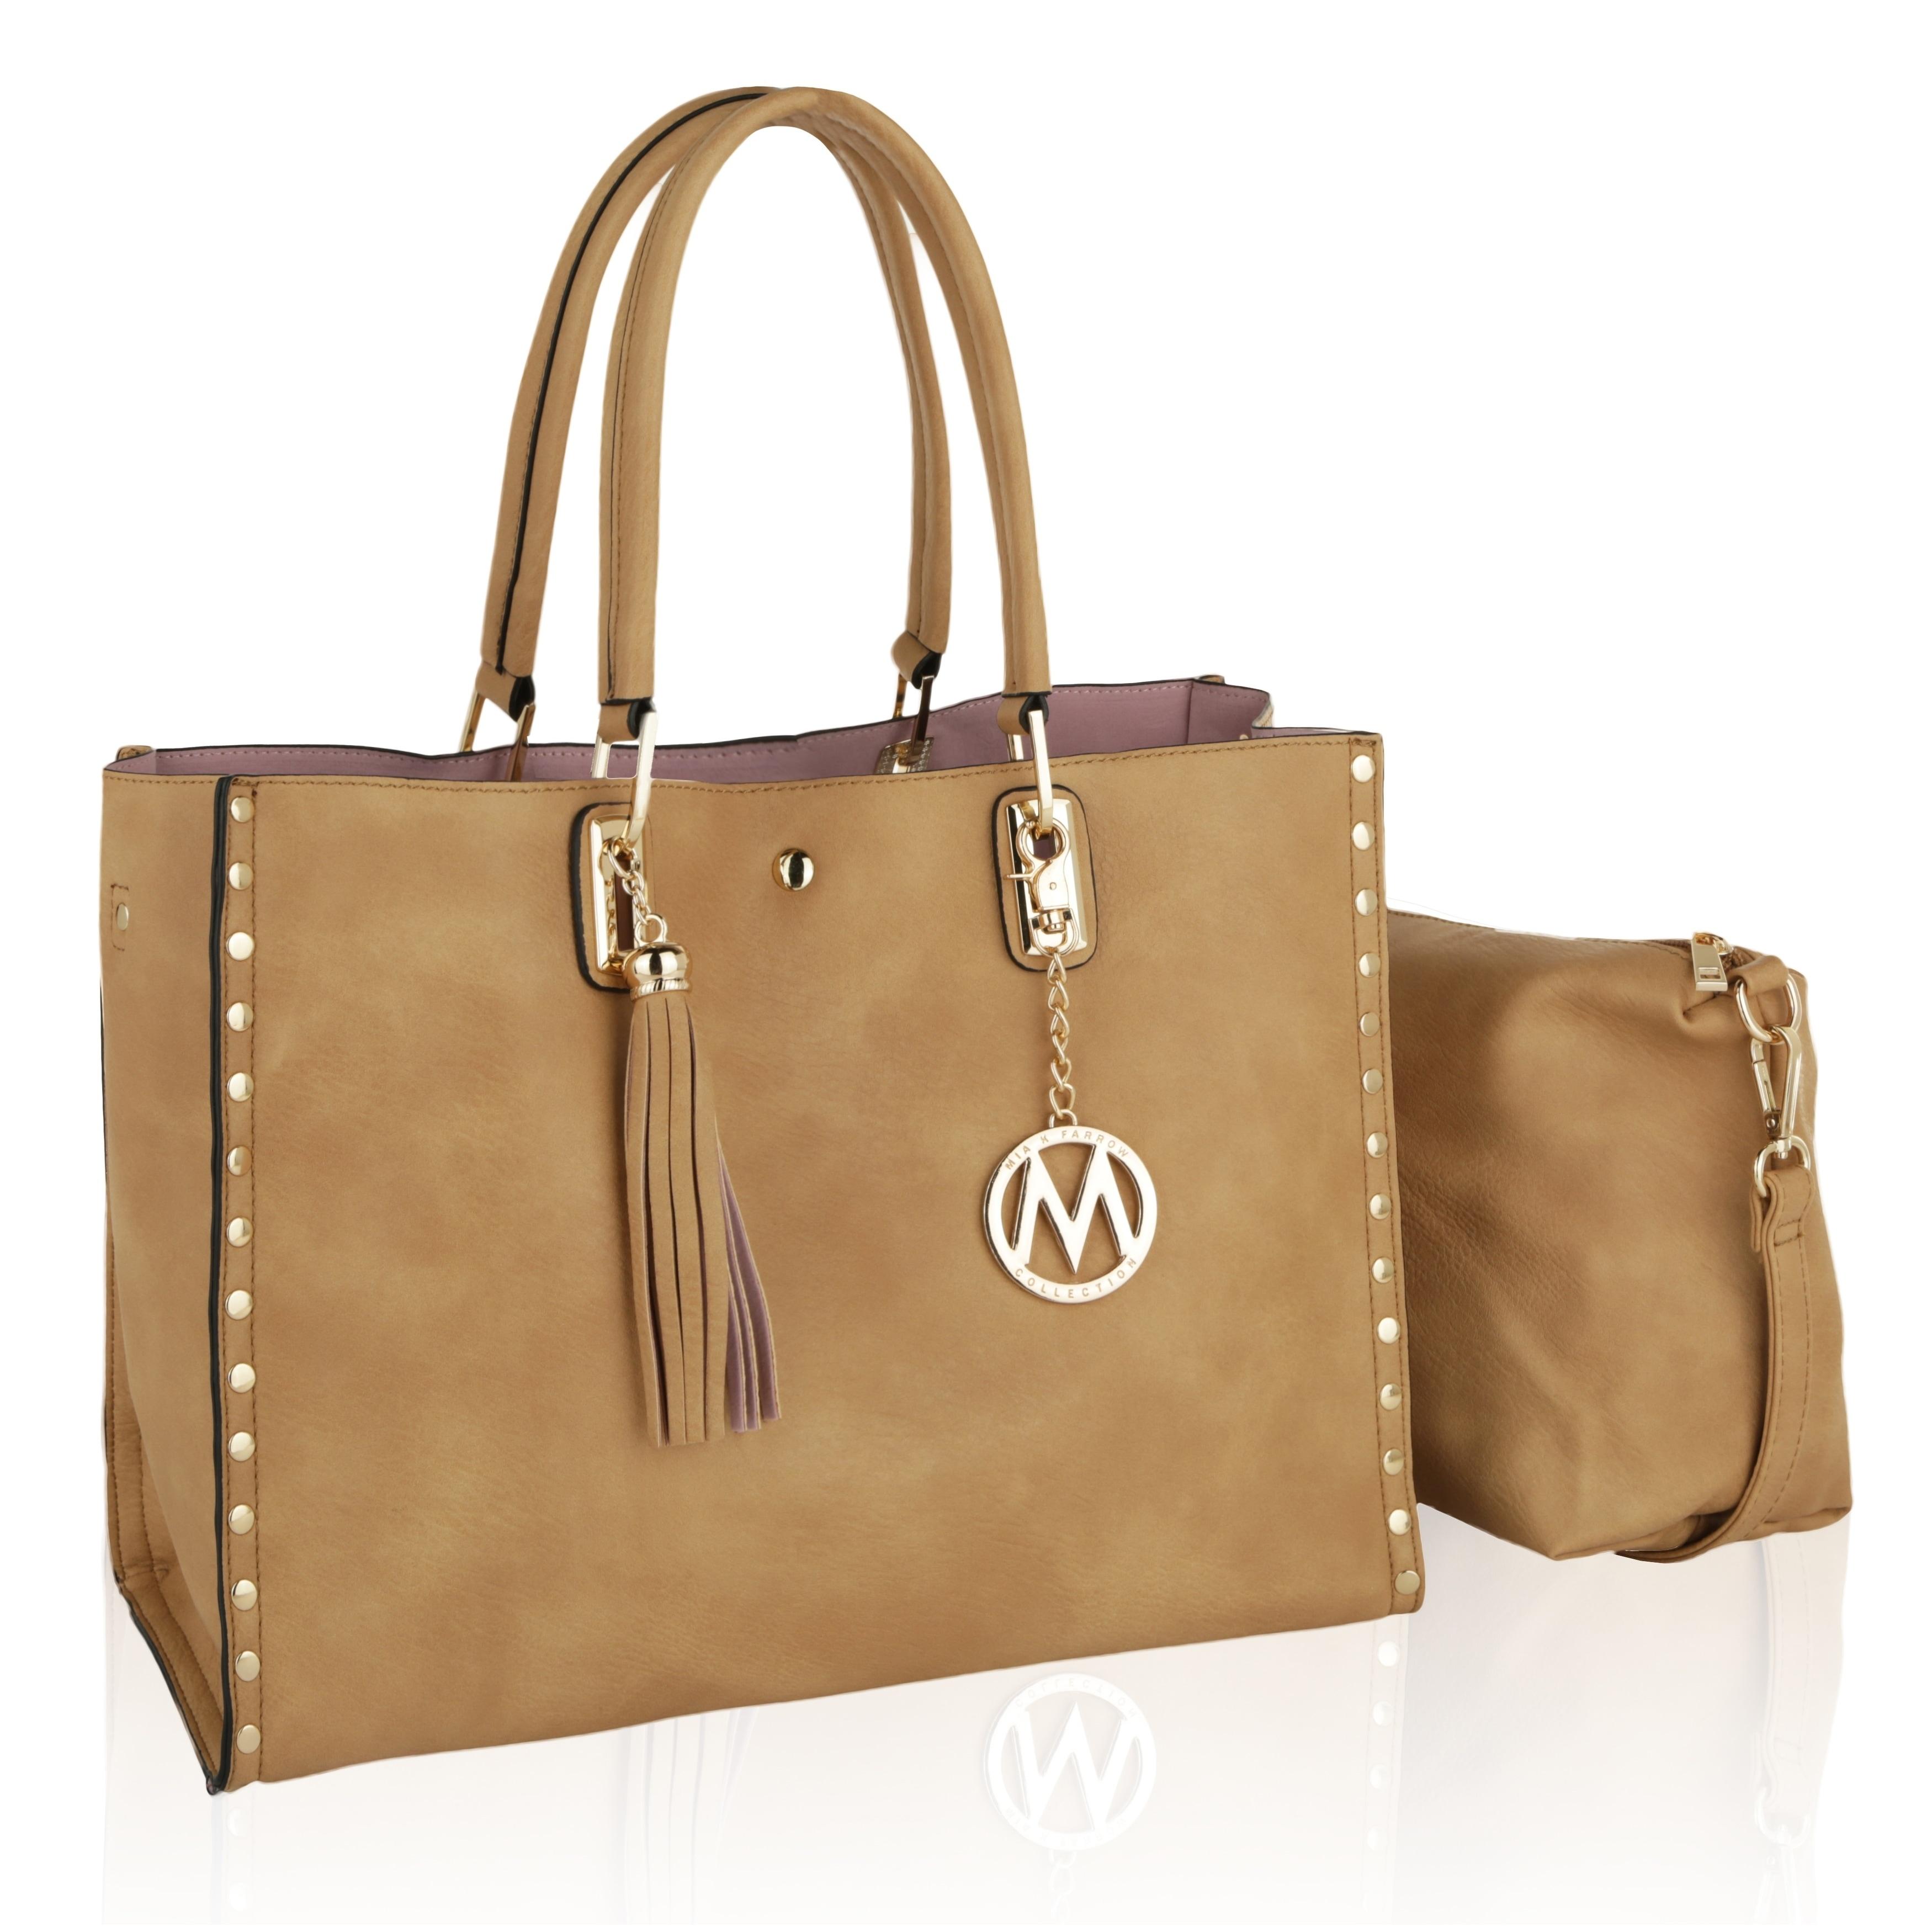 40d4ecc102bb Shop MKF Collection by Mia K Farrow Isa Satchel Handbag - On Sale - Free  Shipping Today - Overstock - 18849878